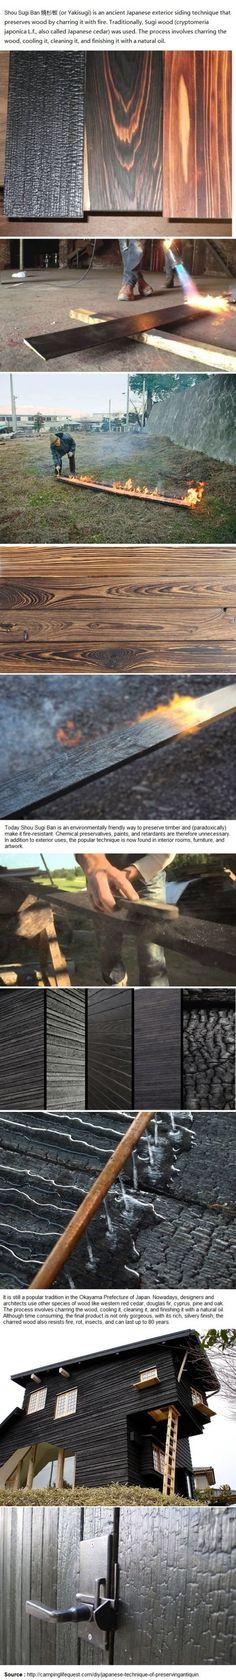 Japanese technique of preserving/antiquing wood - Imgur